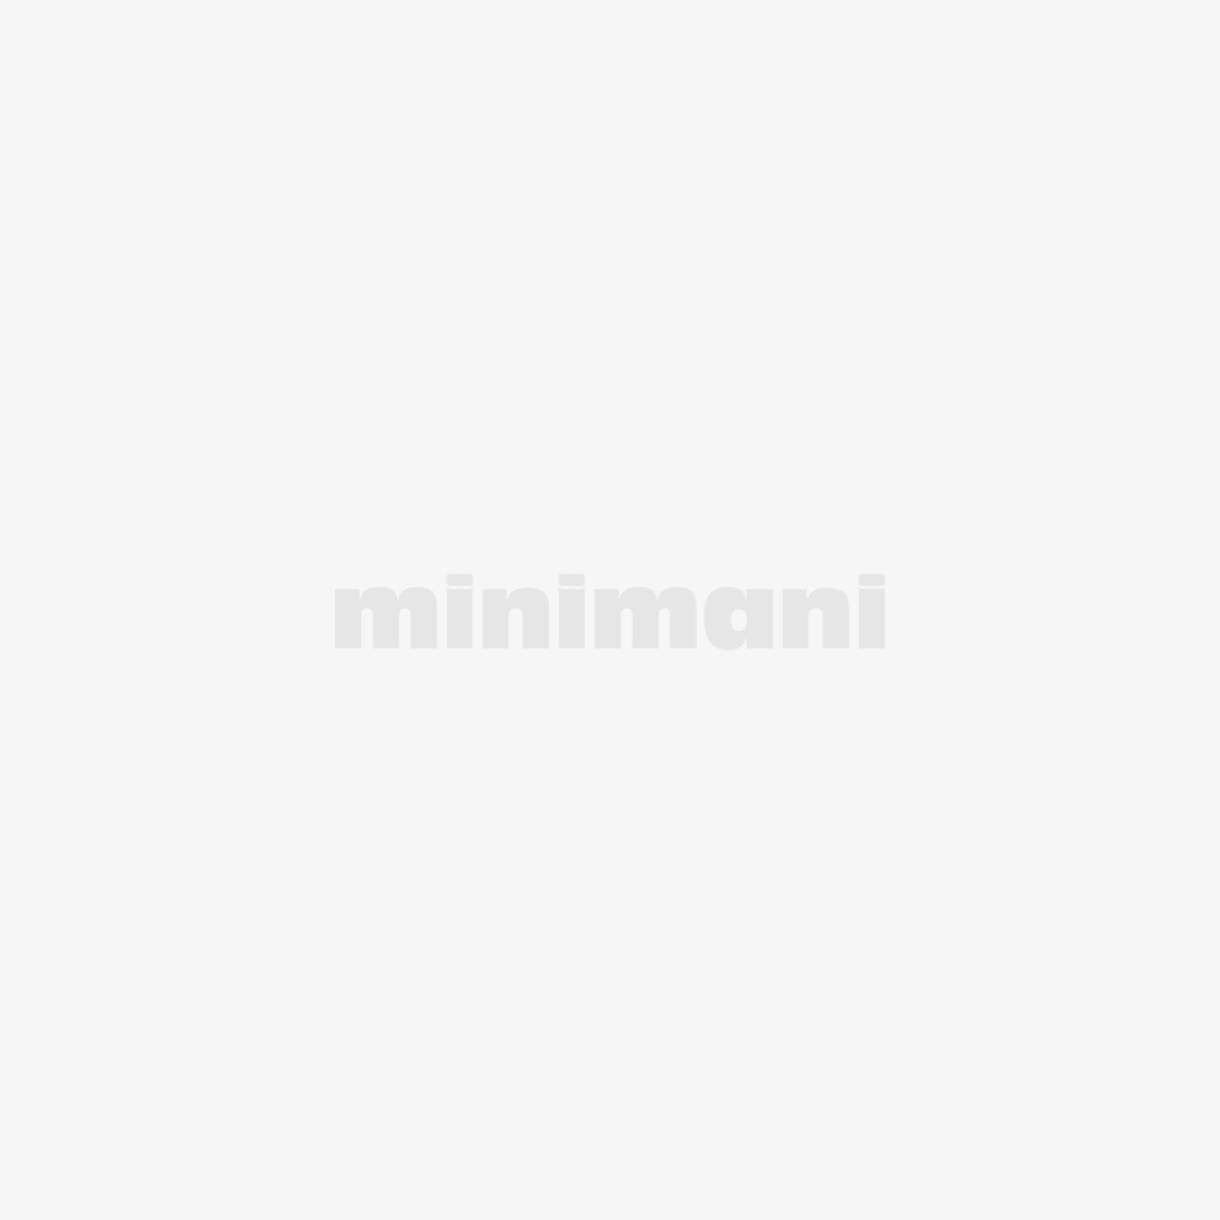 M-FILTER RAITISILMASUODATIN MAC 8066 PRIUS, RAV4, YARIS I